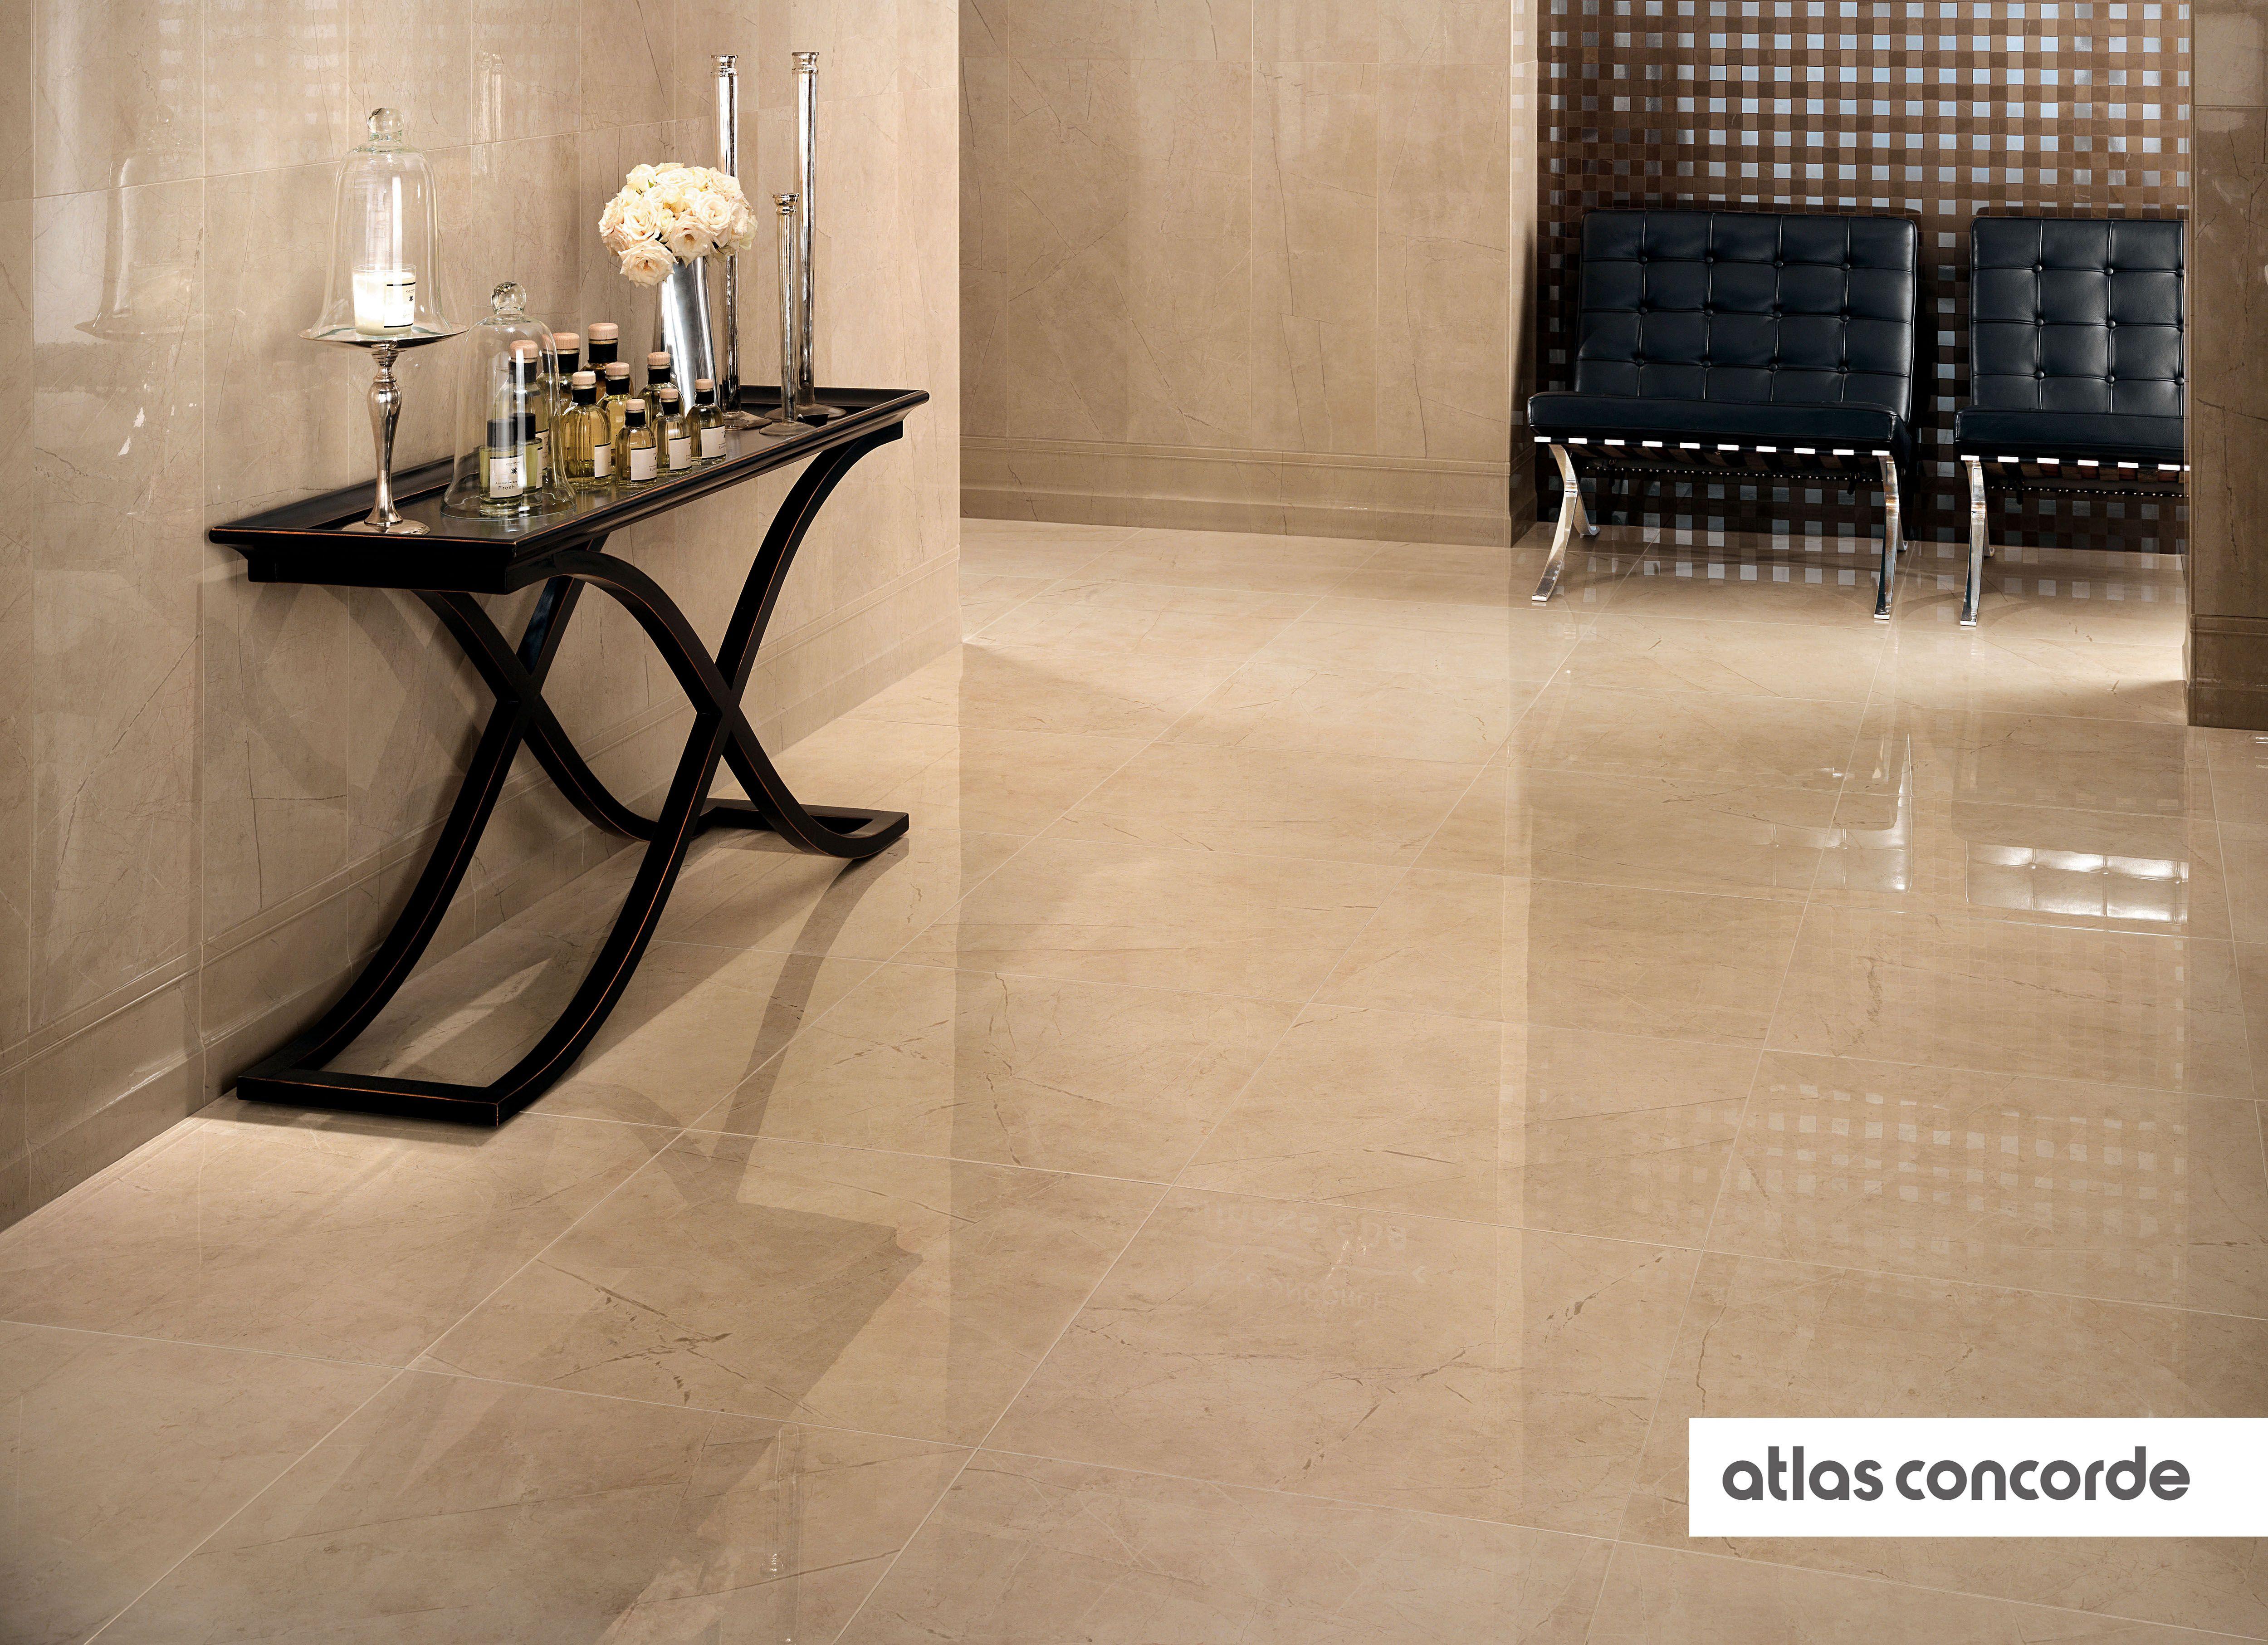 Marvel Bronze Floor Design Atlasconcorde Tiles Ceramic Porcelaintiles Porcelanato Para Sala Limpar Piso Porcelanato Decoracao Sala Estar